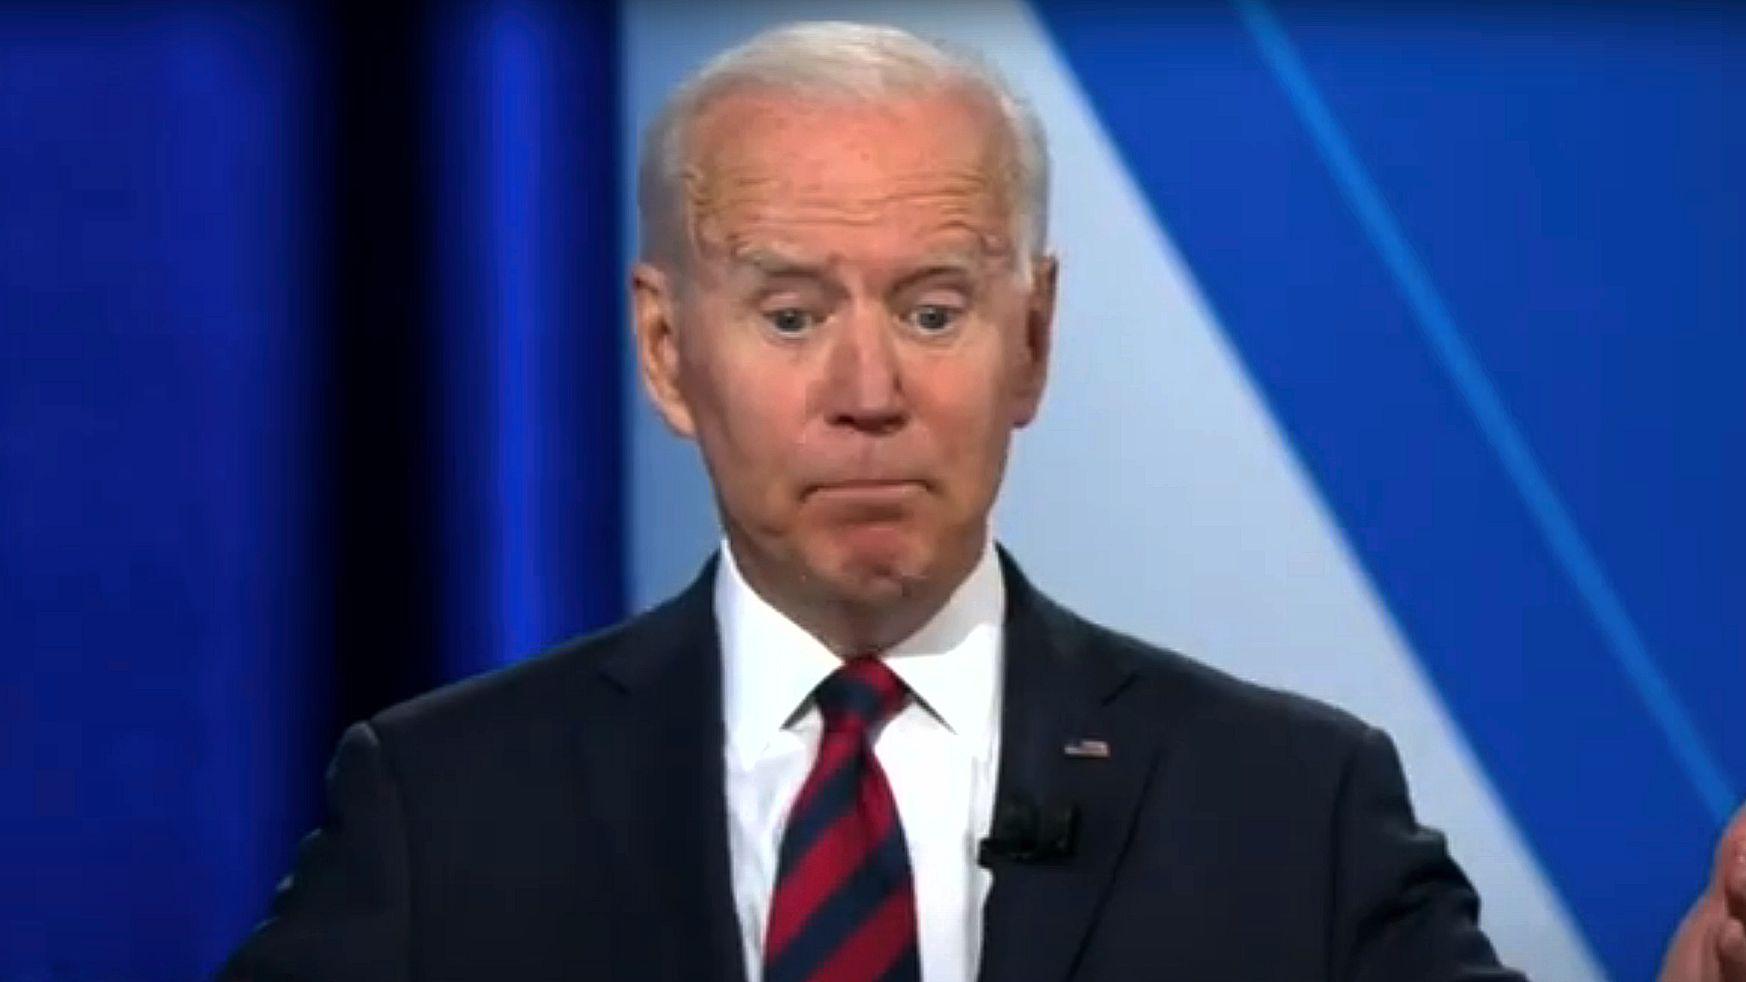 Joe Biden at CNN Townhall on July 21, 2021